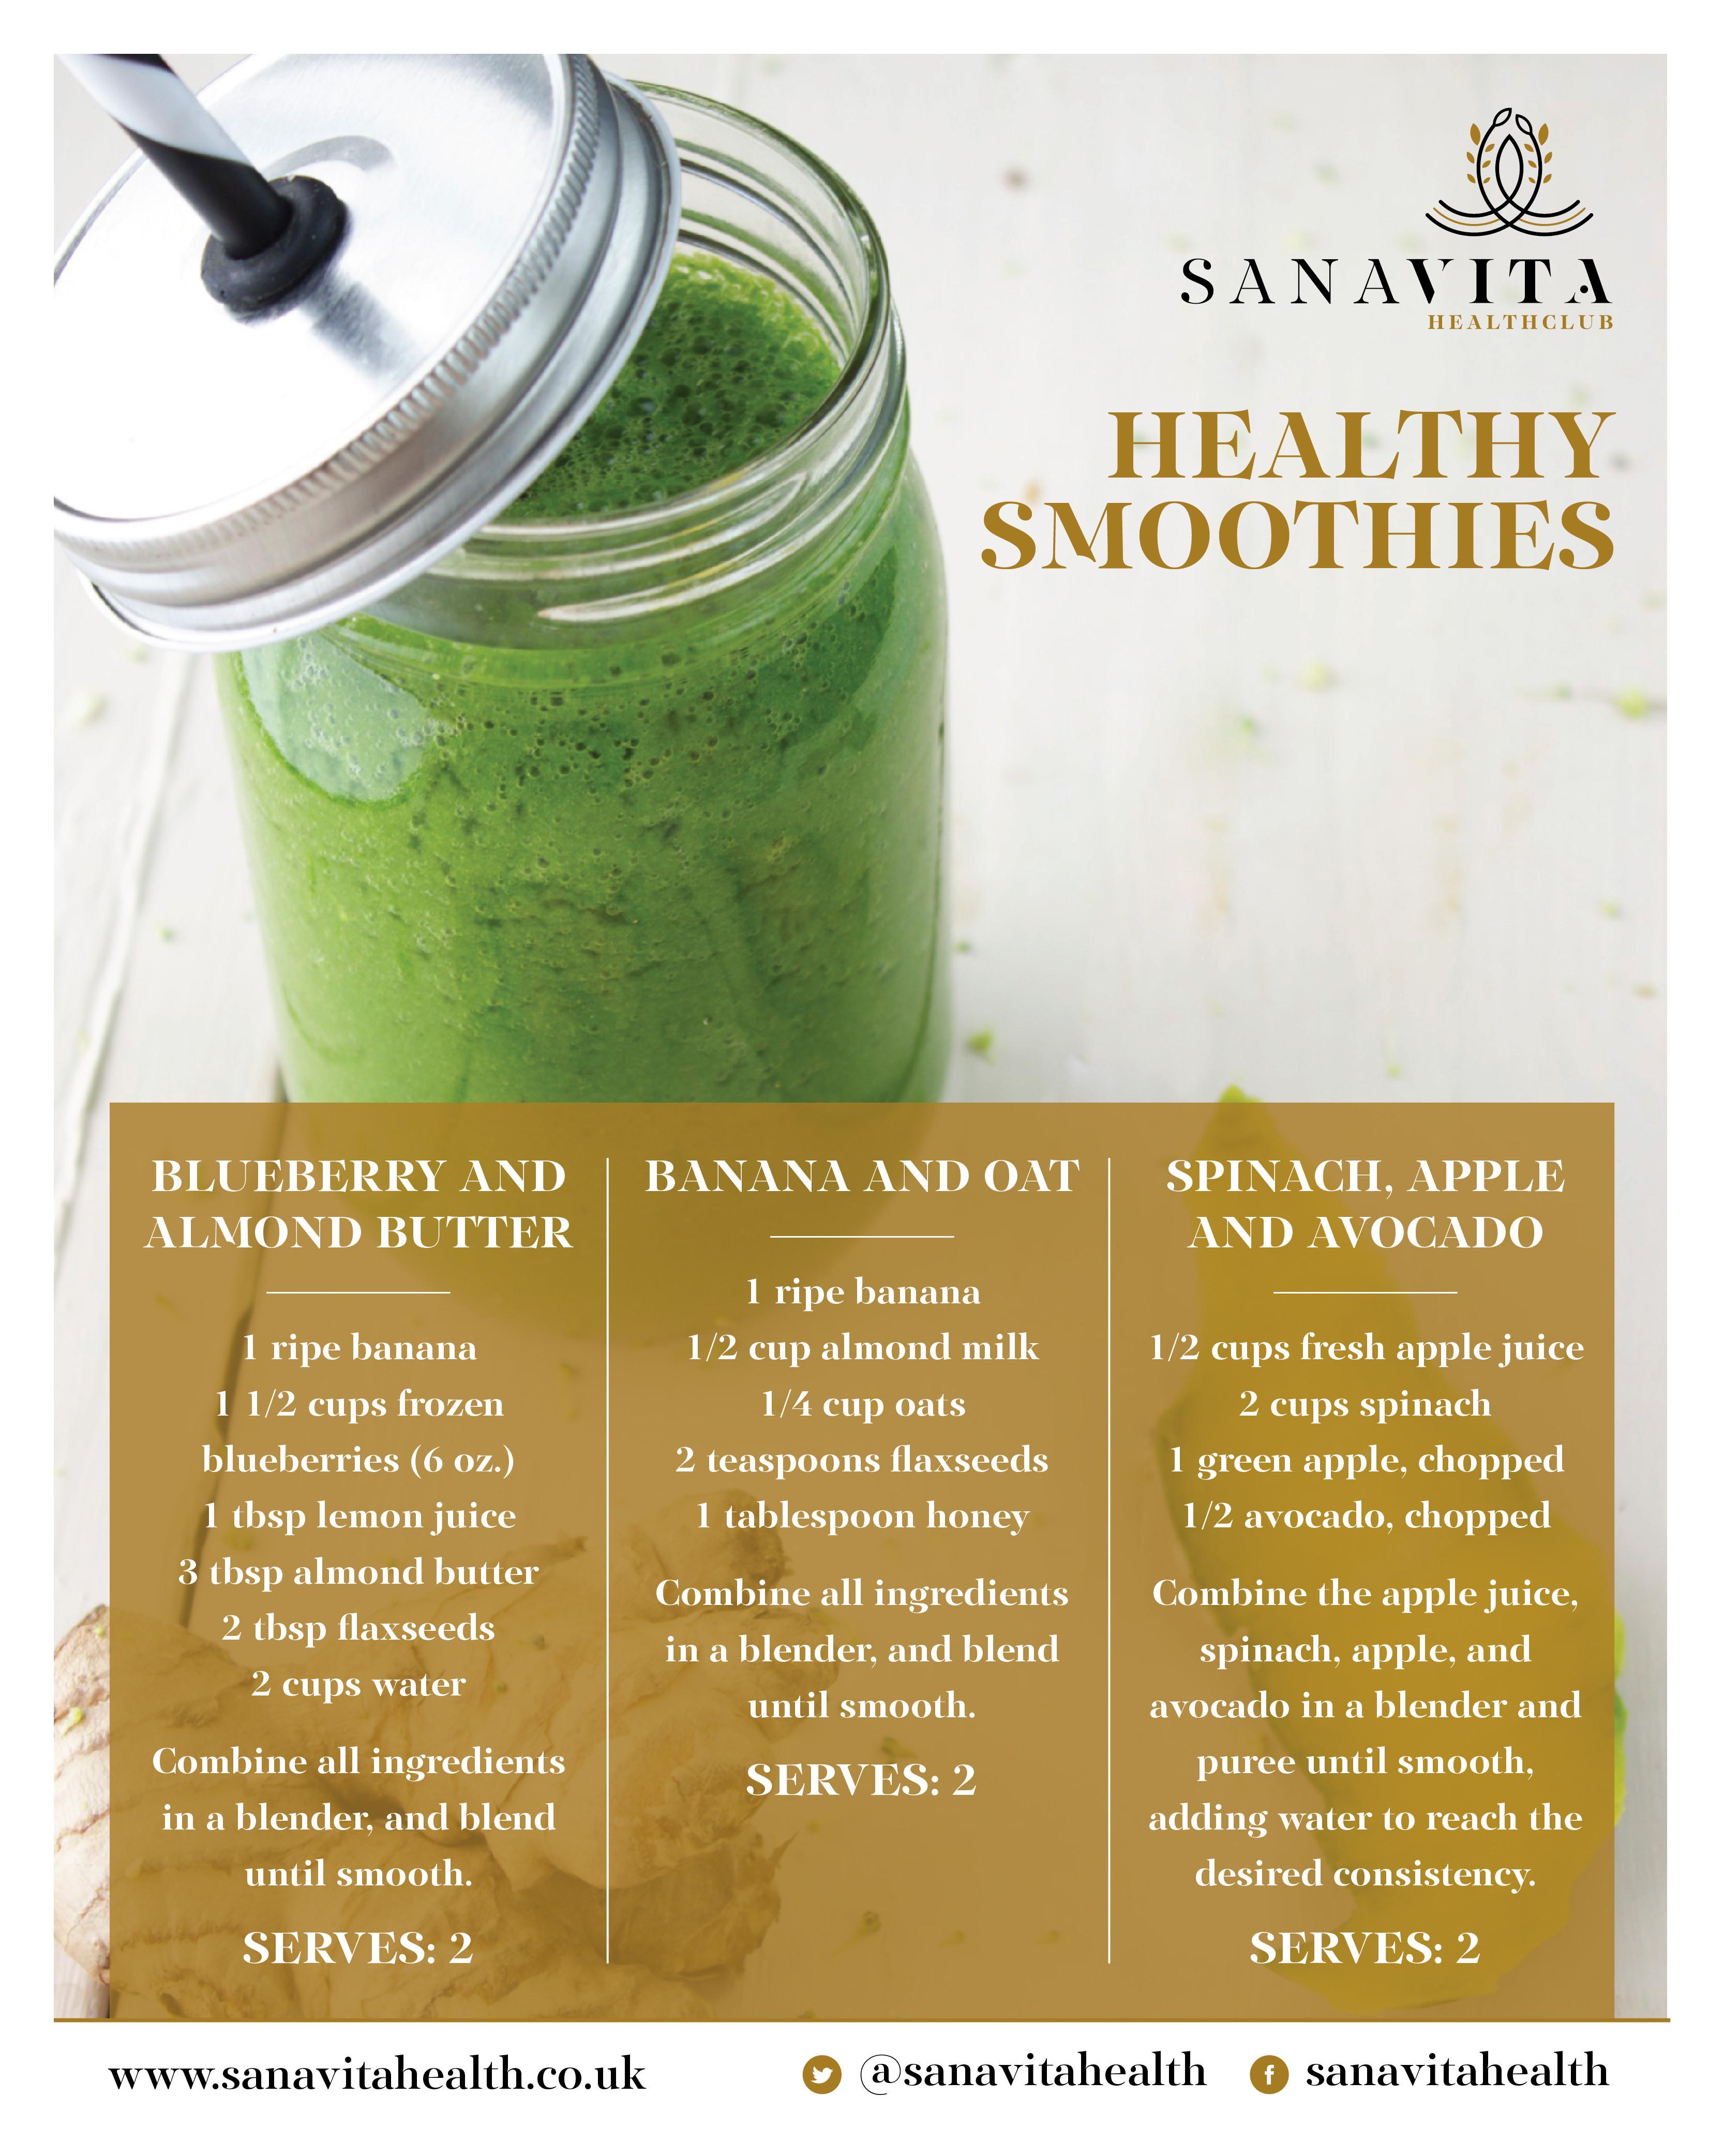 Smoothies Recipes Healthy  Sana Vita Health Club